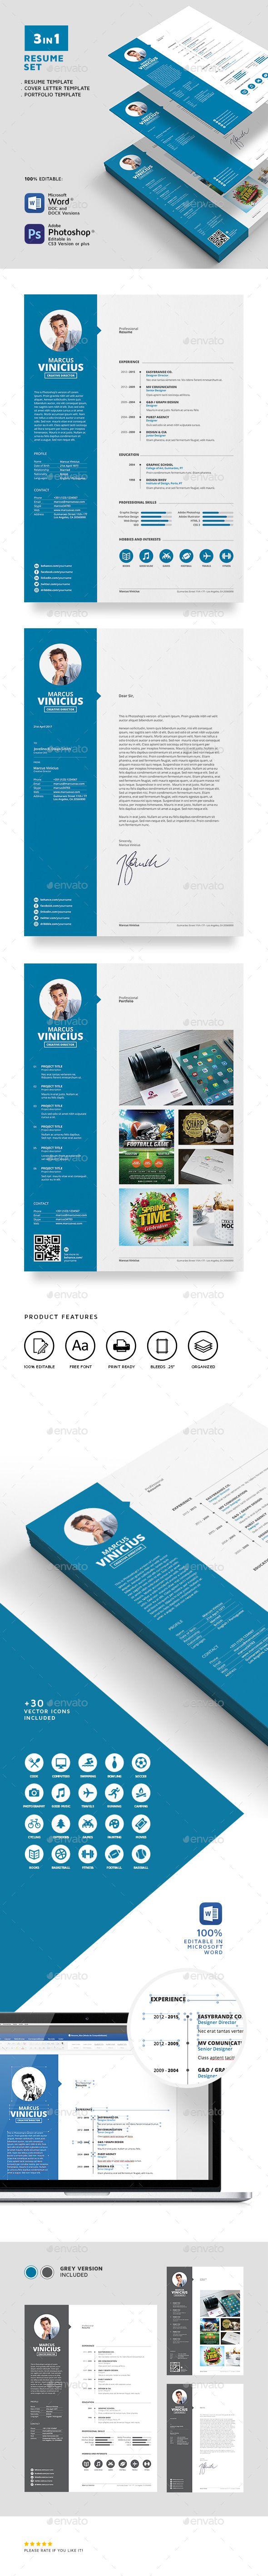 Resume Set Template PSD #design Download: http://graphicriver.net/item/resume-set/13745479?ref=ksioks